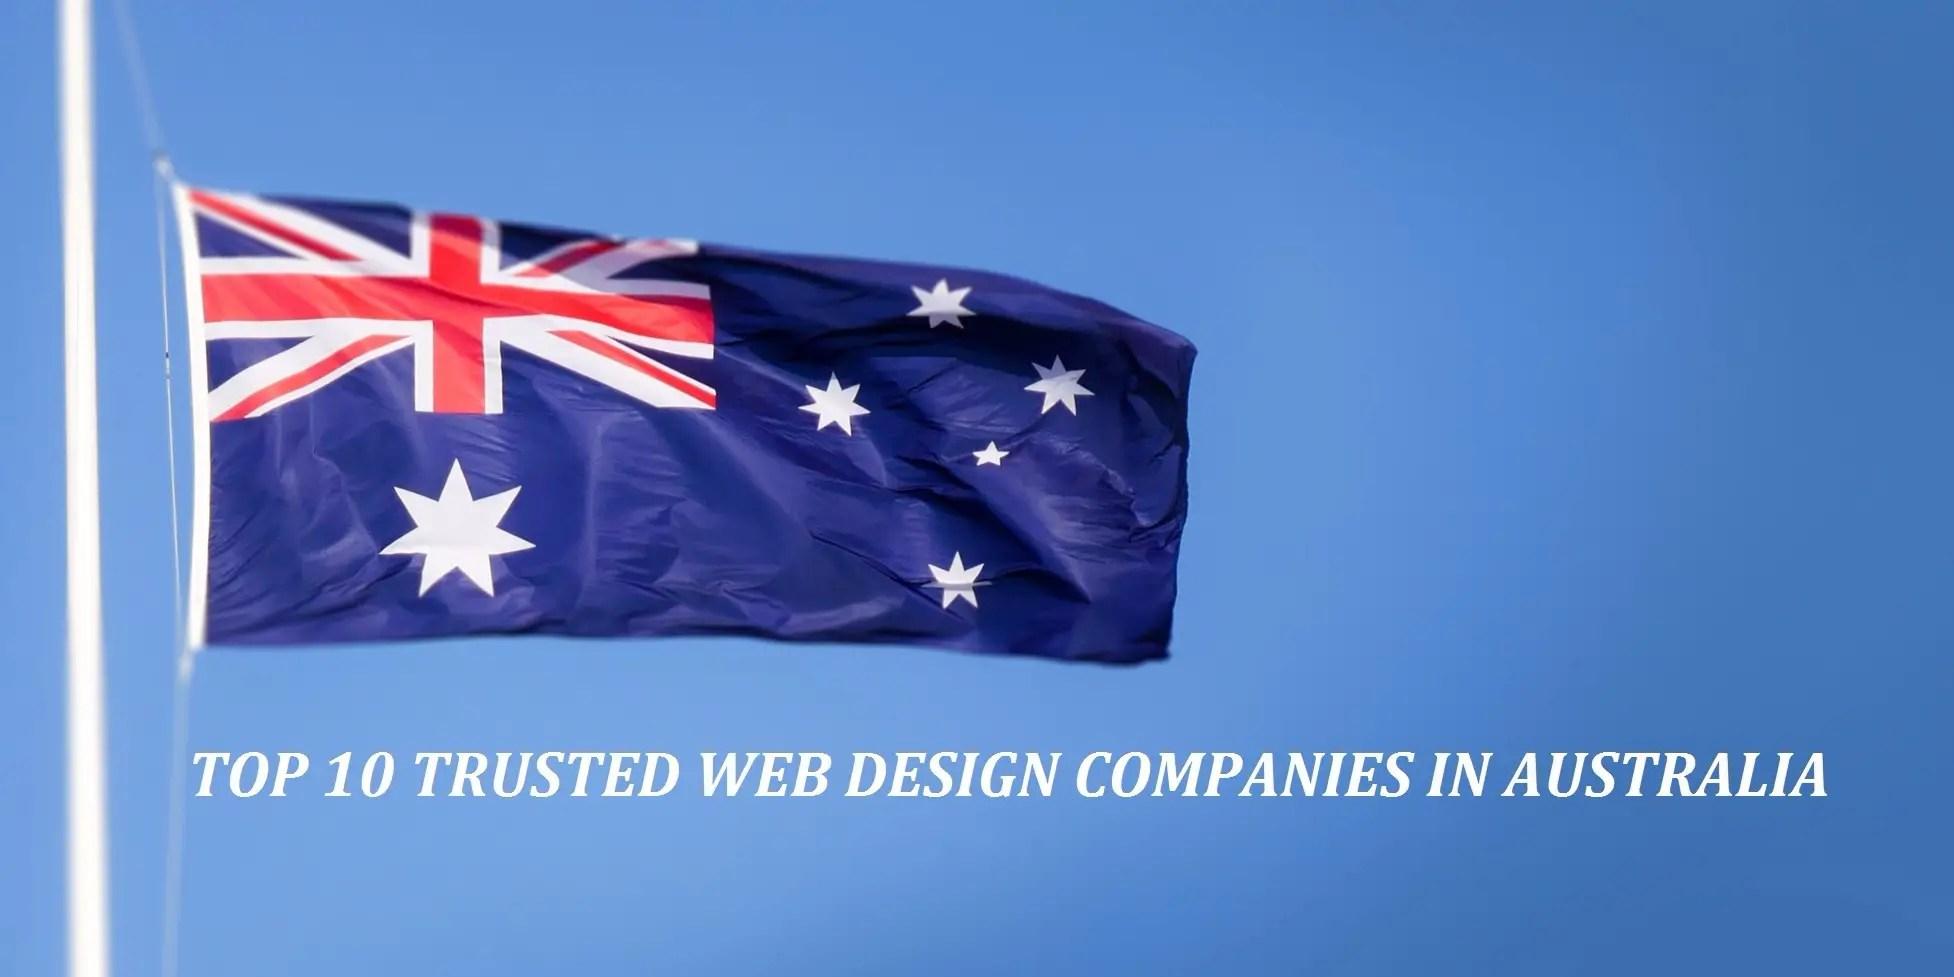 Australia web design companies